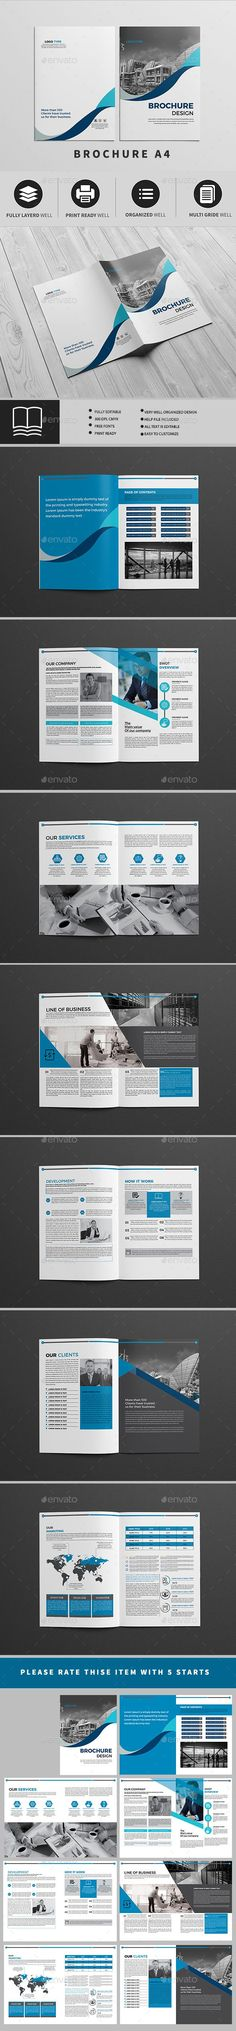 Brochure Template - Brochures Print Templates Download here : https://graphicriver.net/item/brochure-template/19486897?s_rank=4&ref=Al-fatih